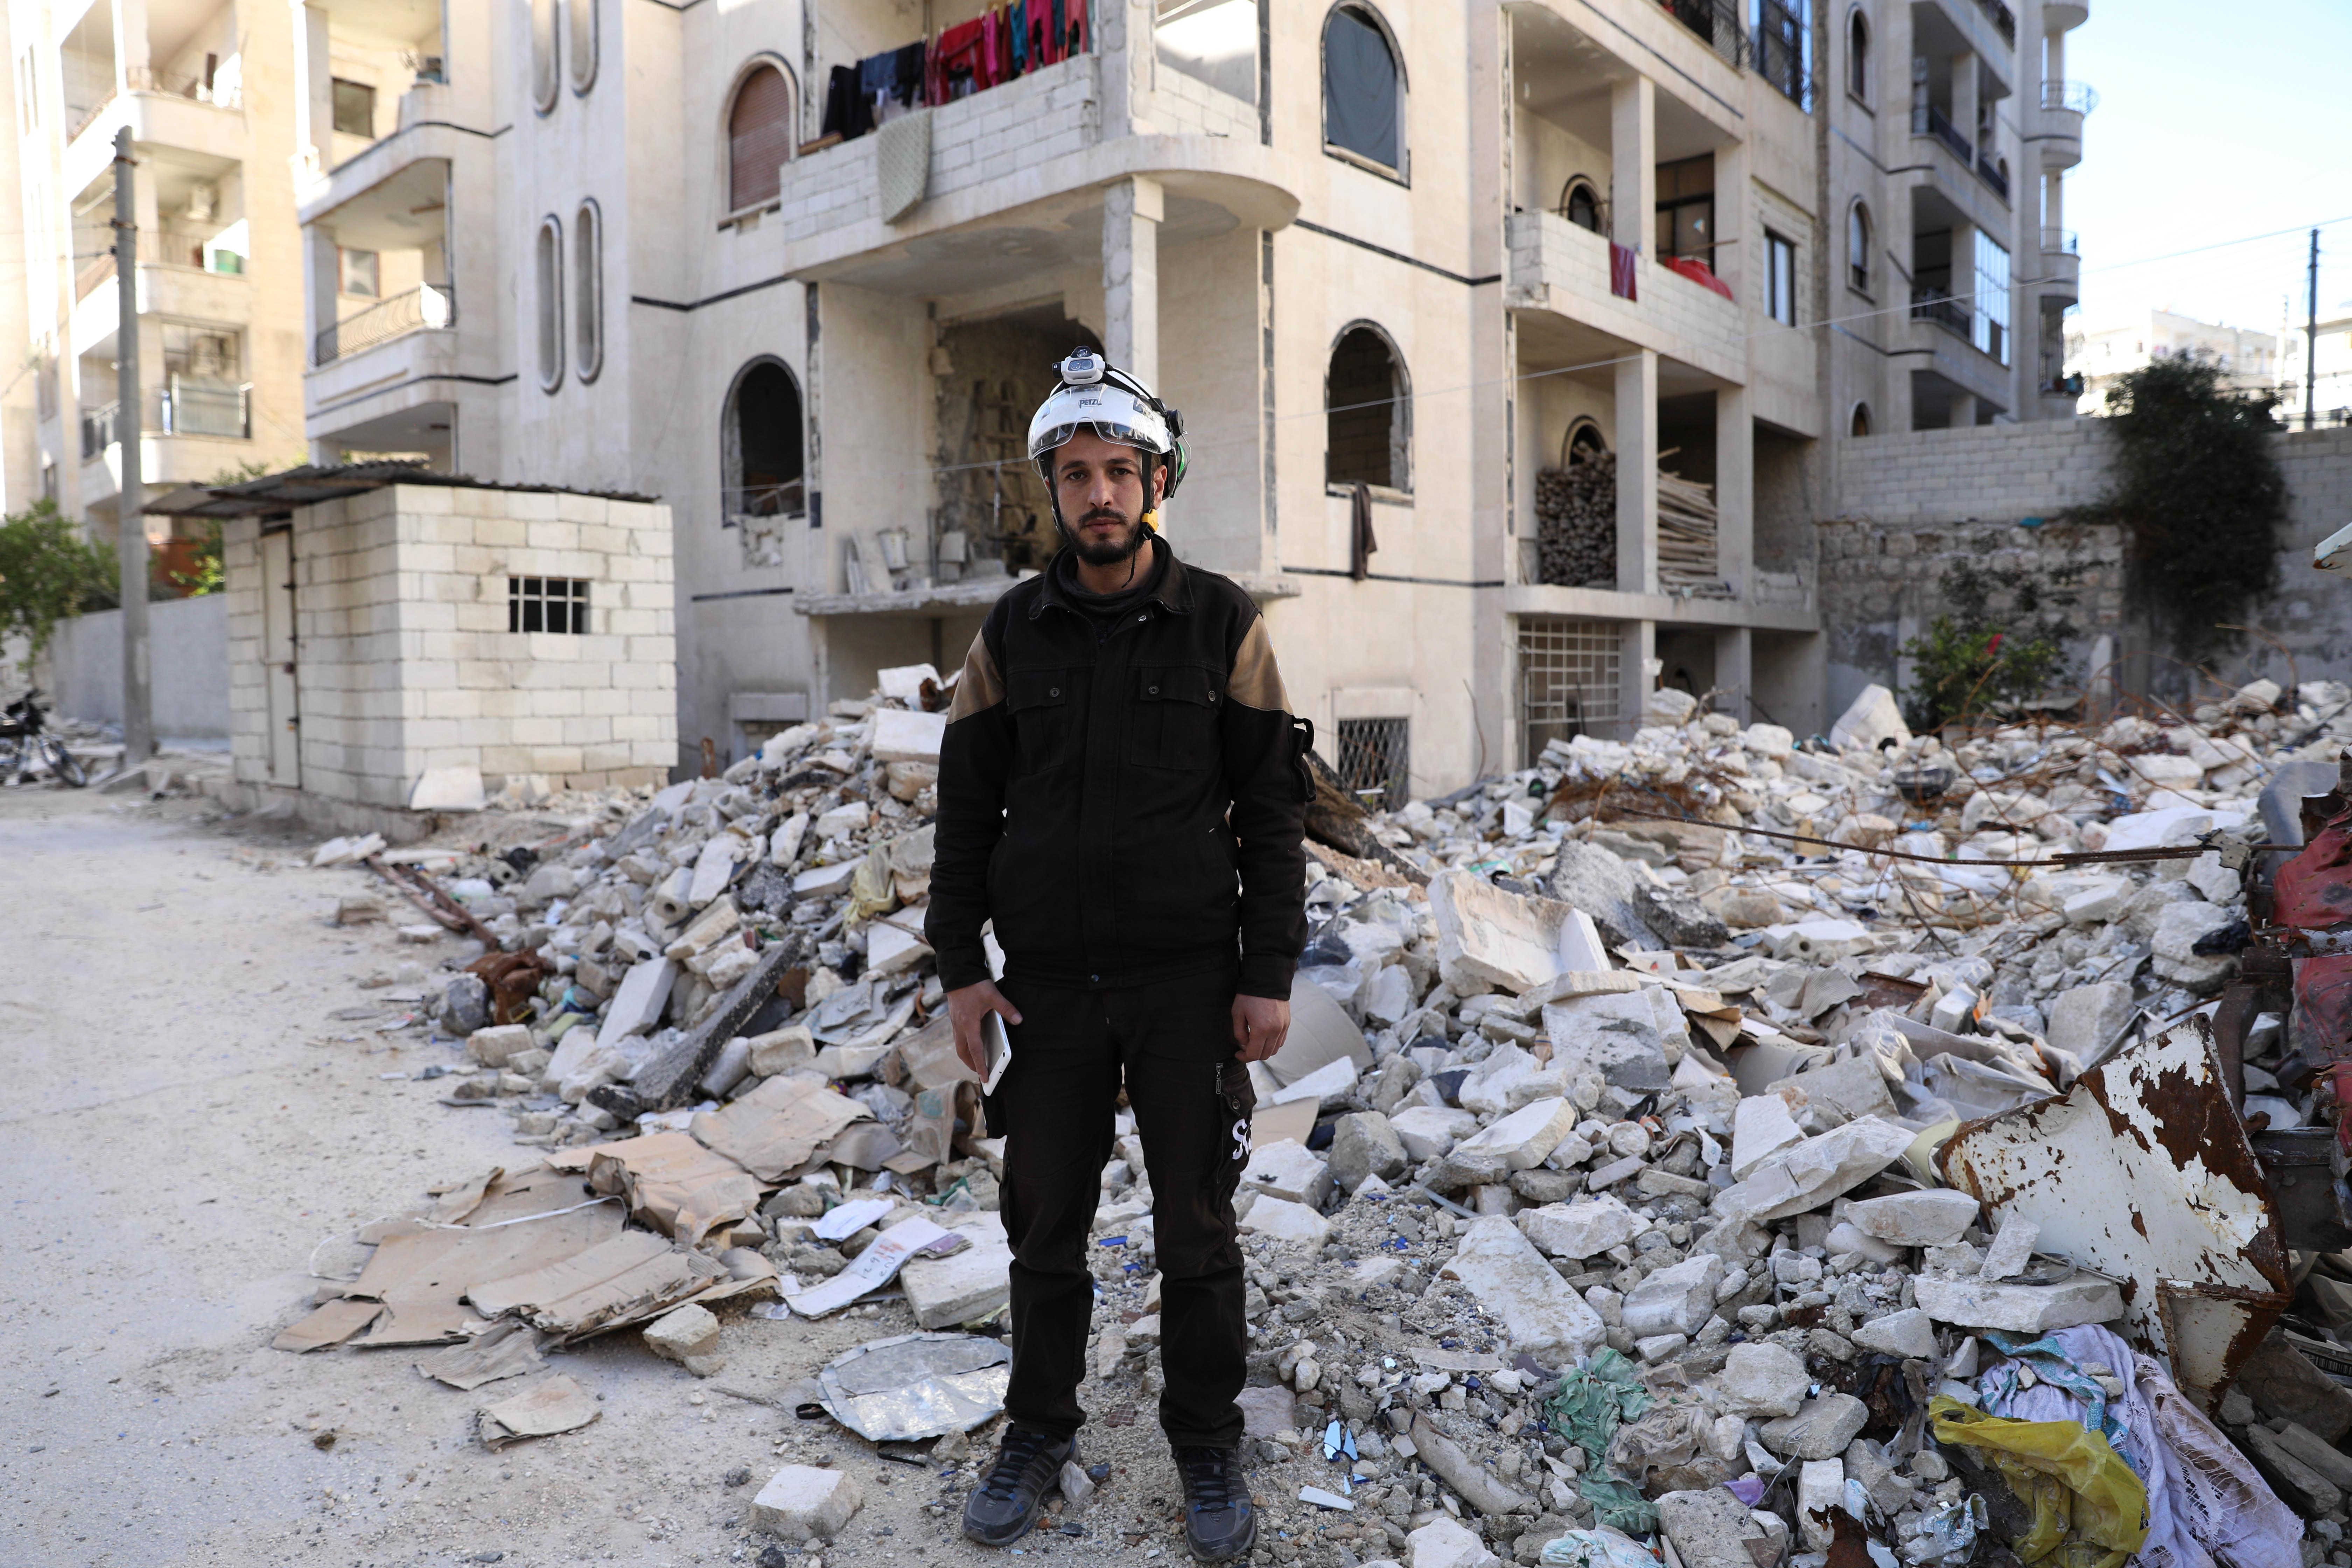 Omar Haj Kadour | Agence France-Presse